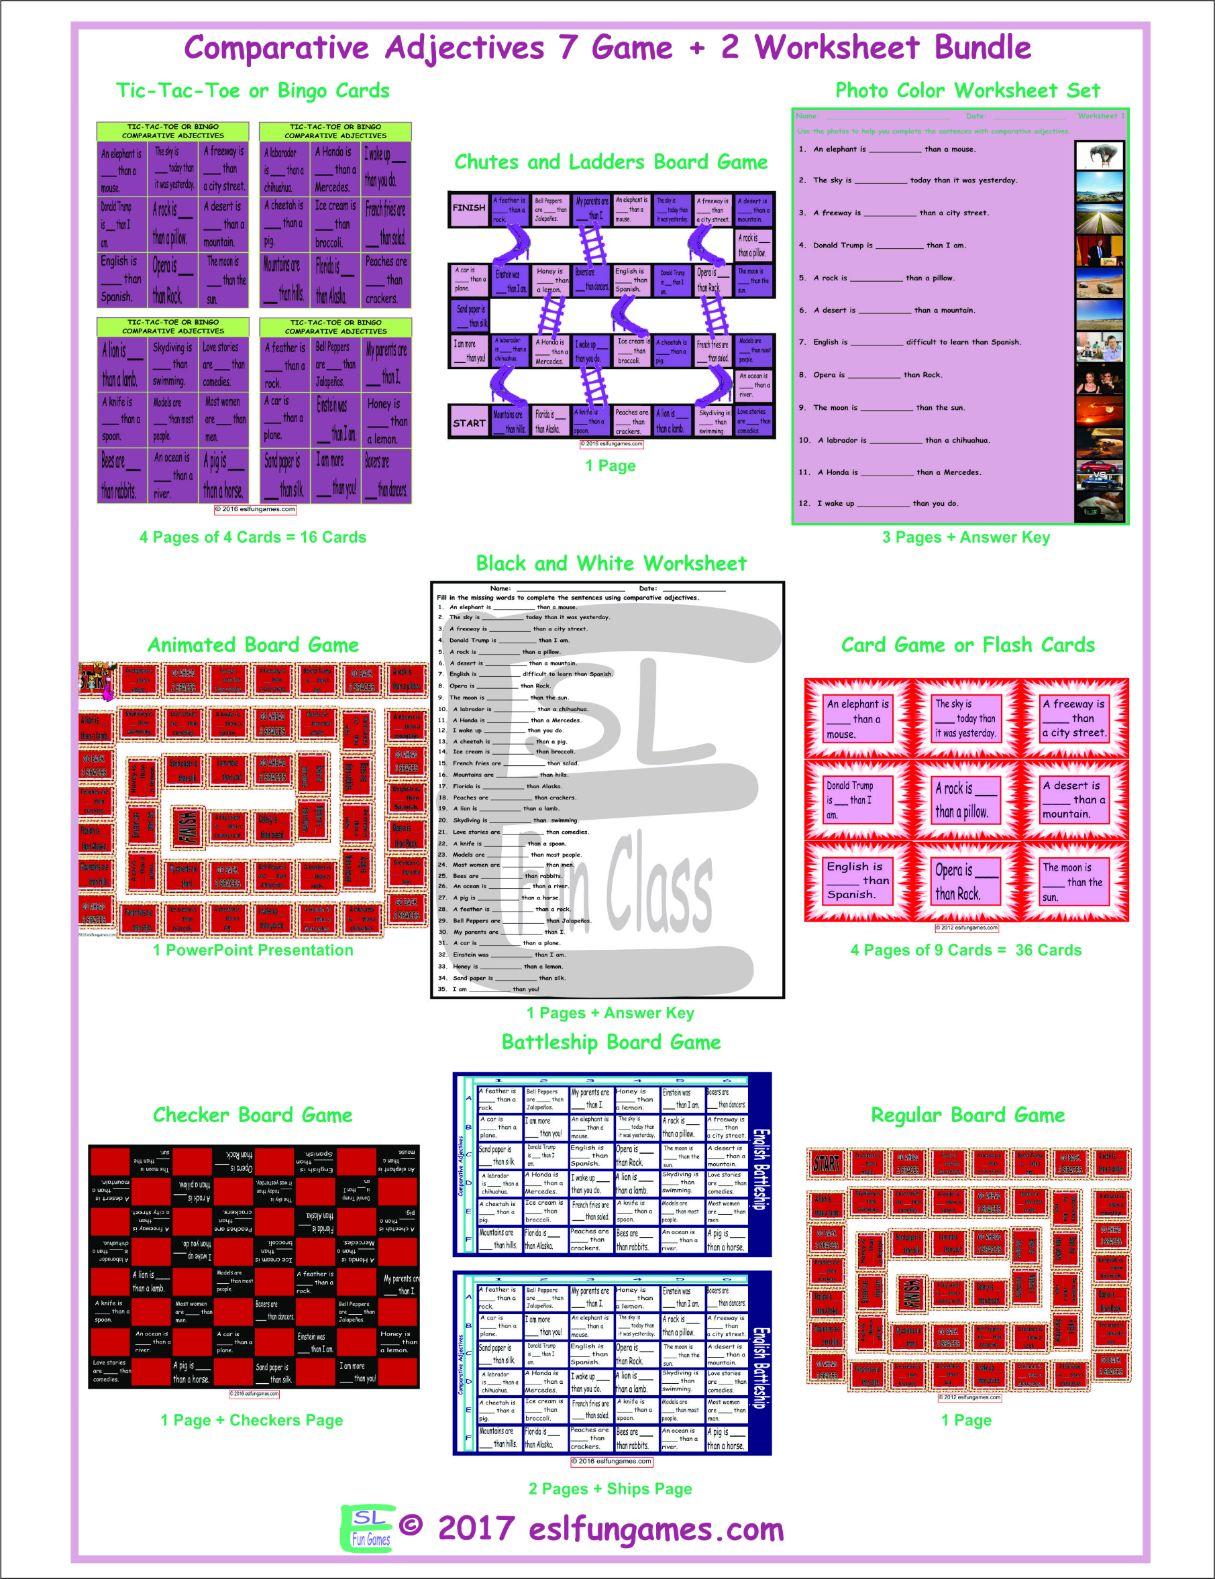 Comparative Adjectives 7 Game Plus 2 Worksheet Bundle By Eslfungames